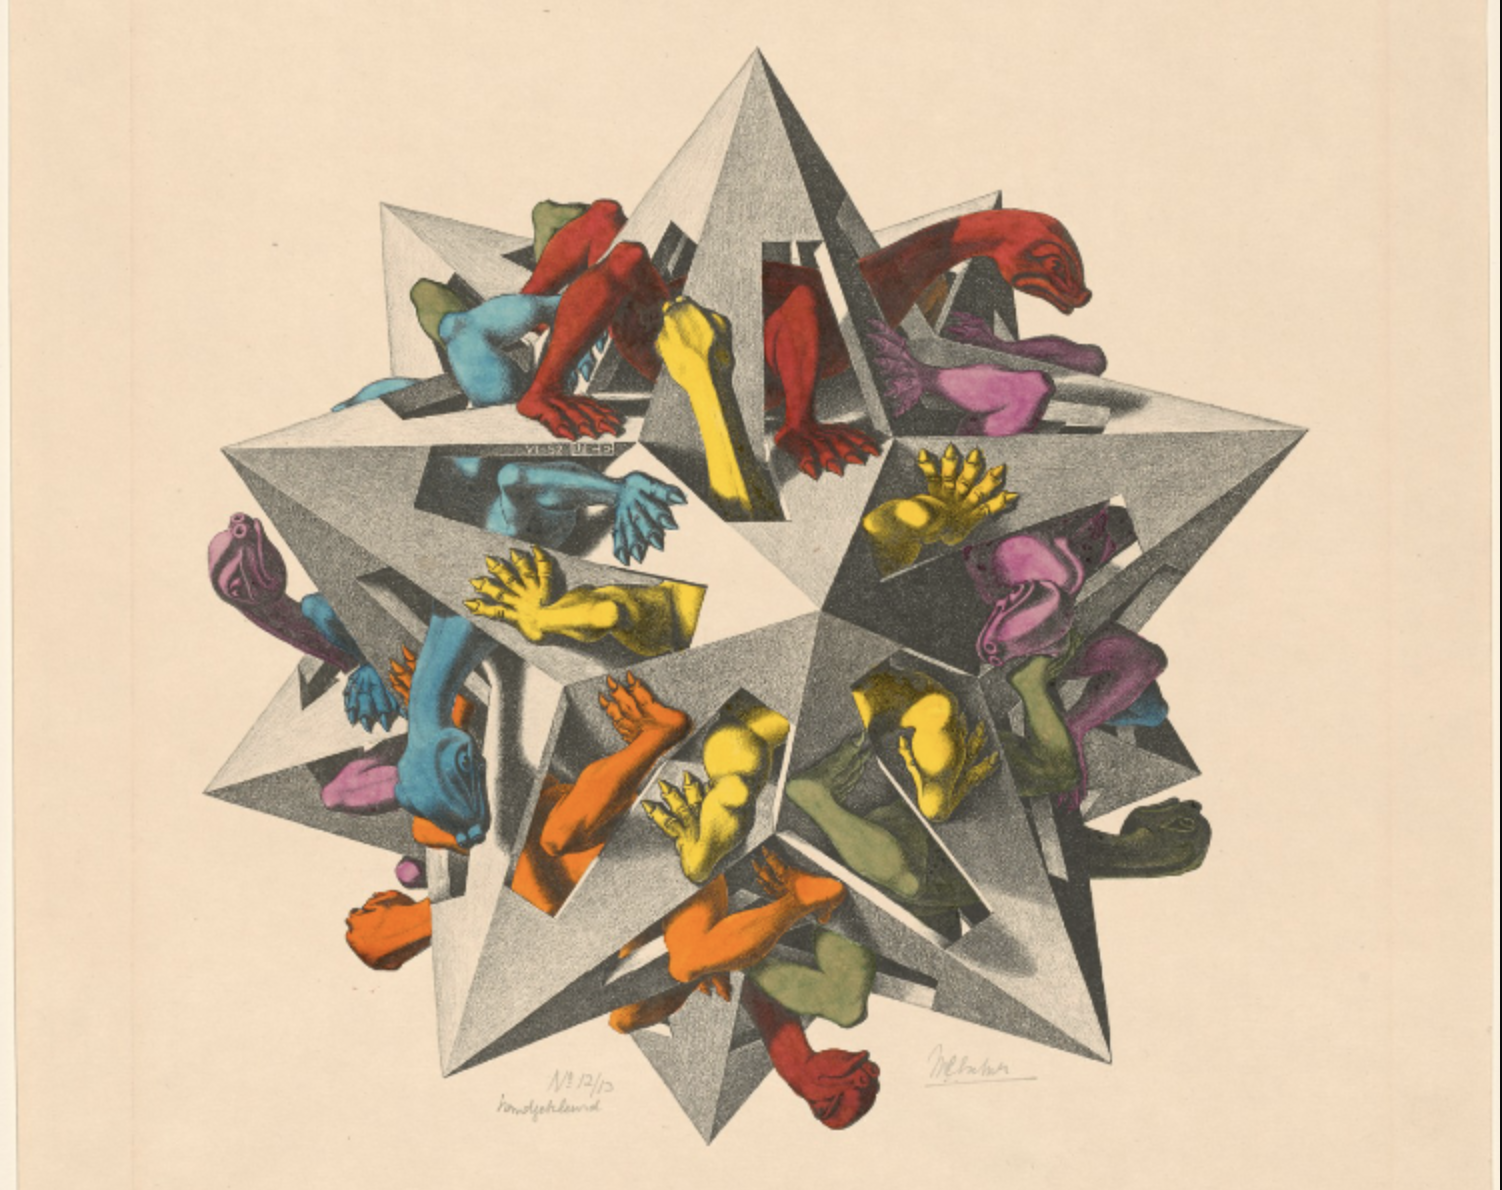 Dozens of M.C. Escher Prints Now Digitized & Put Online by the Boston Public Library